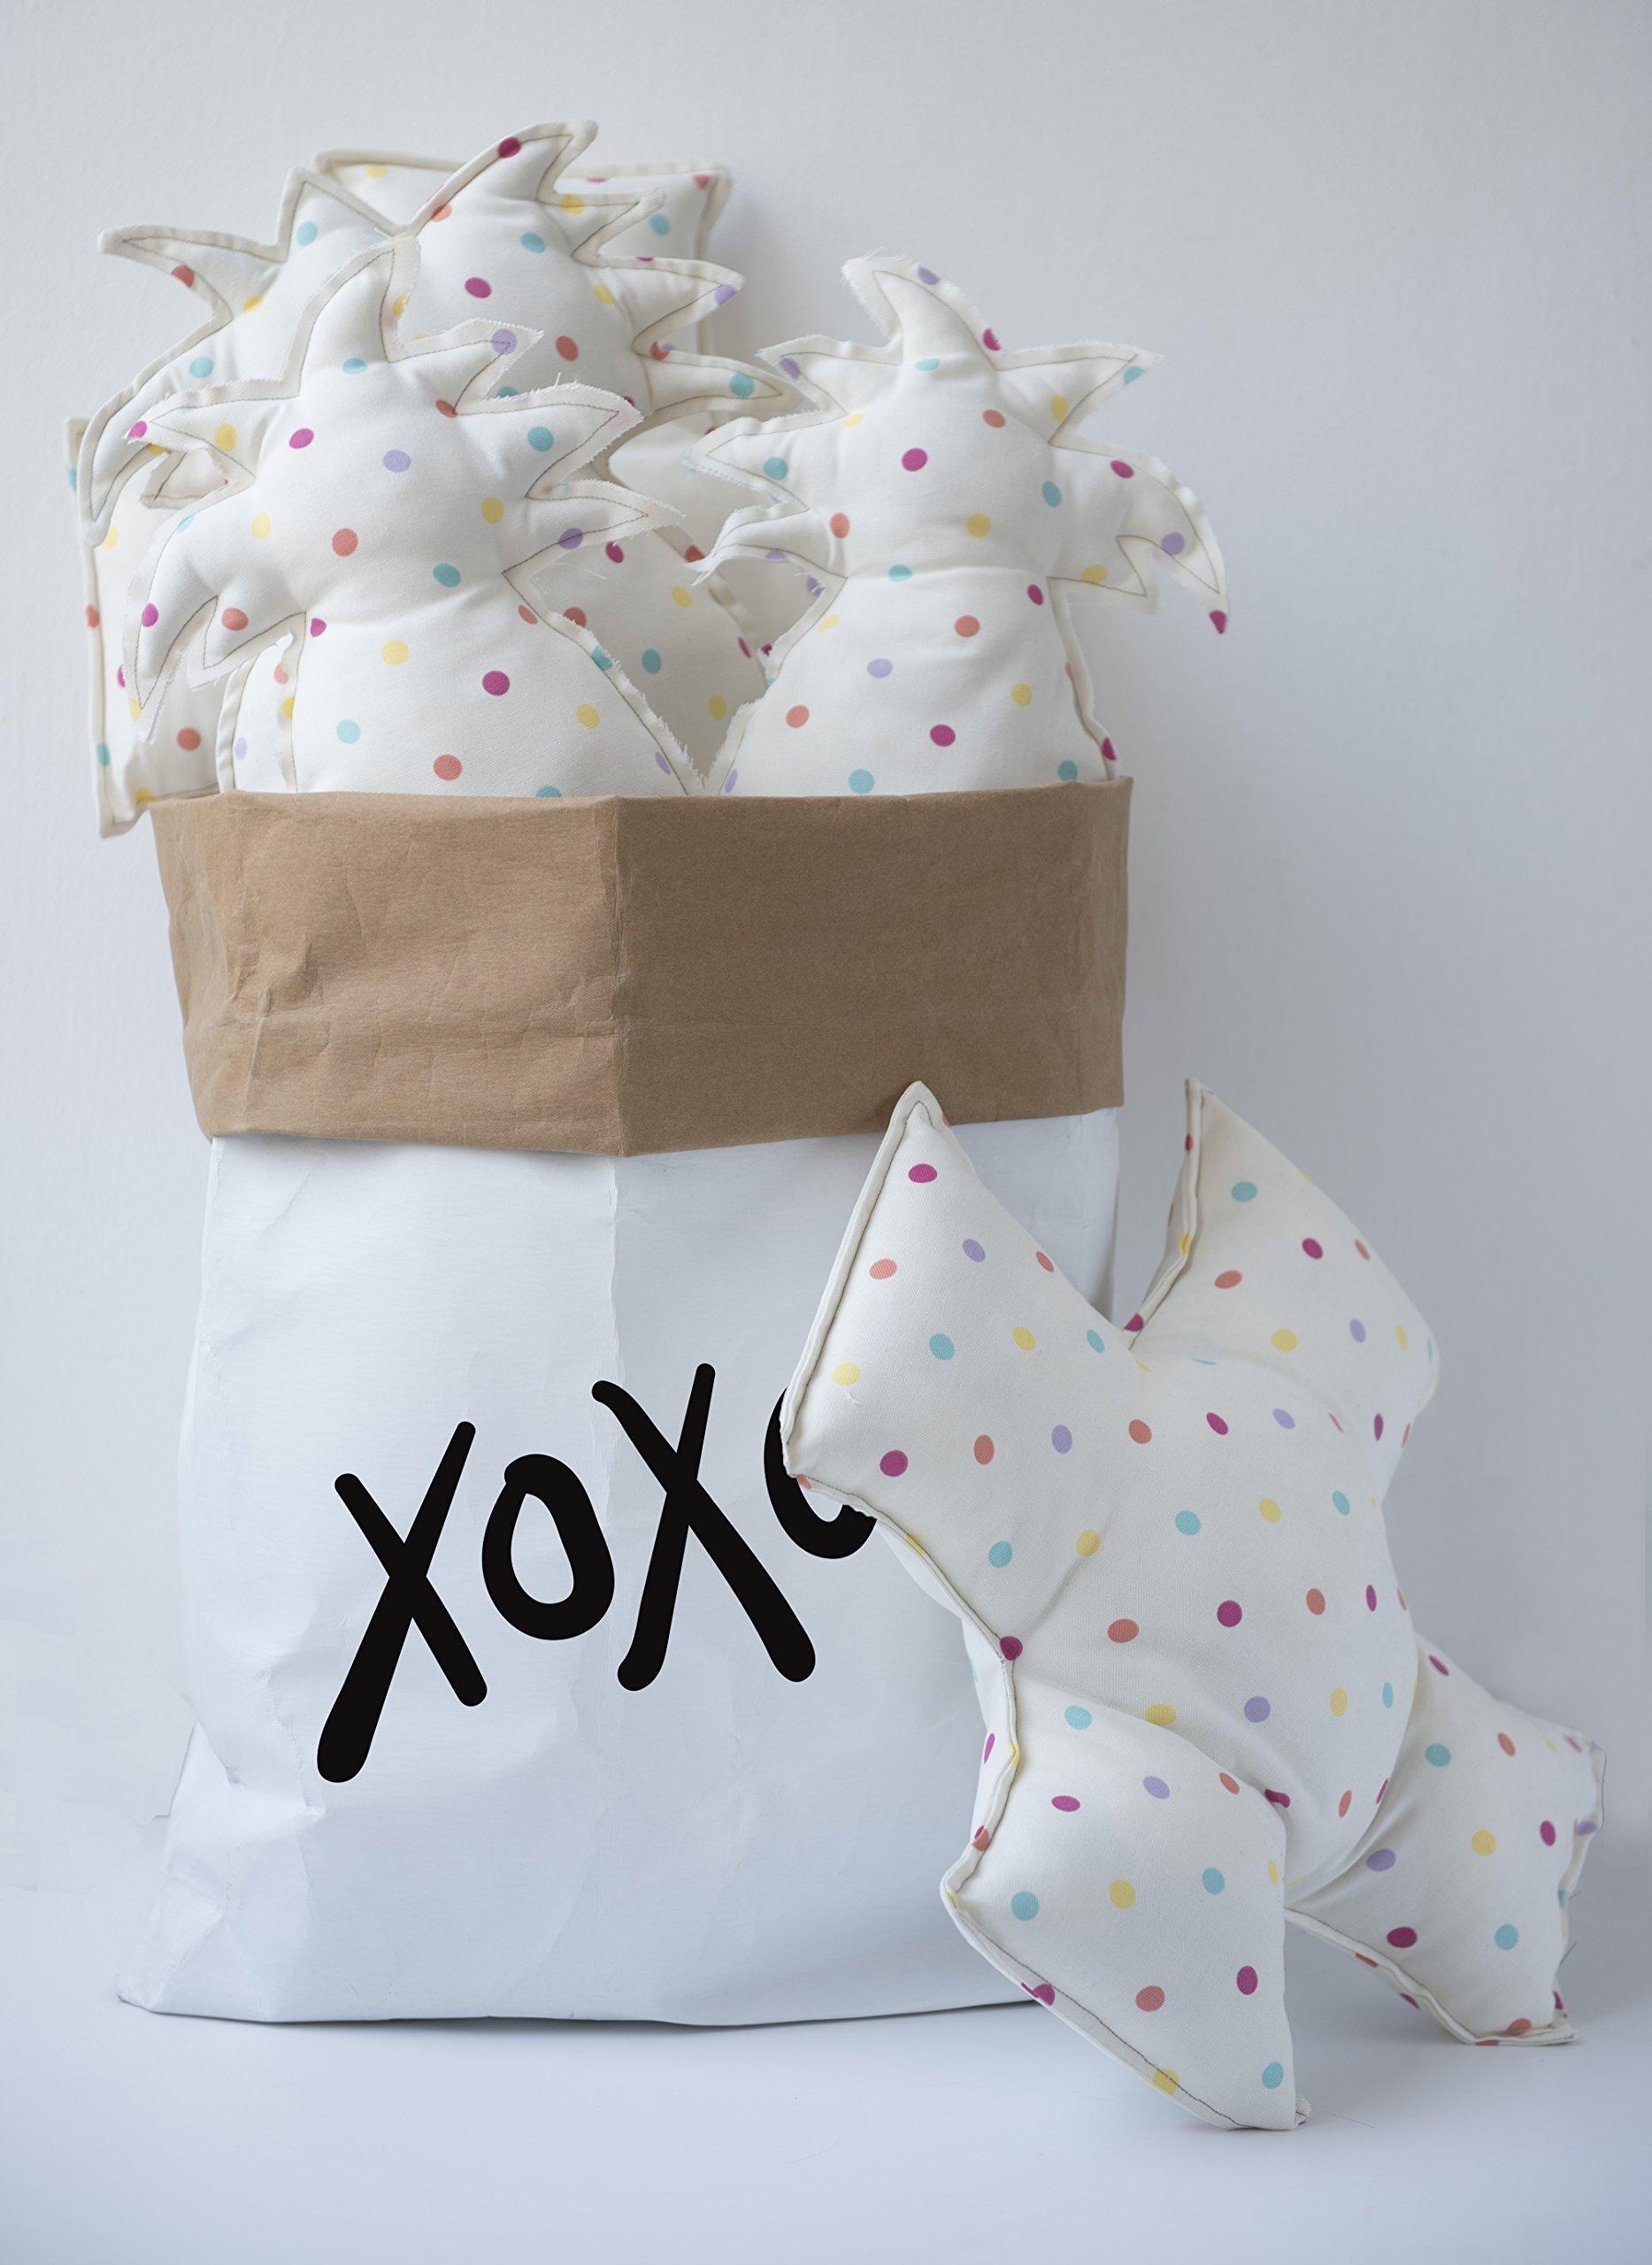 Nursery Interior, Stuffed Animal Storage, Kraft Paper Bag, Kids Room Organization, Shoe Storage